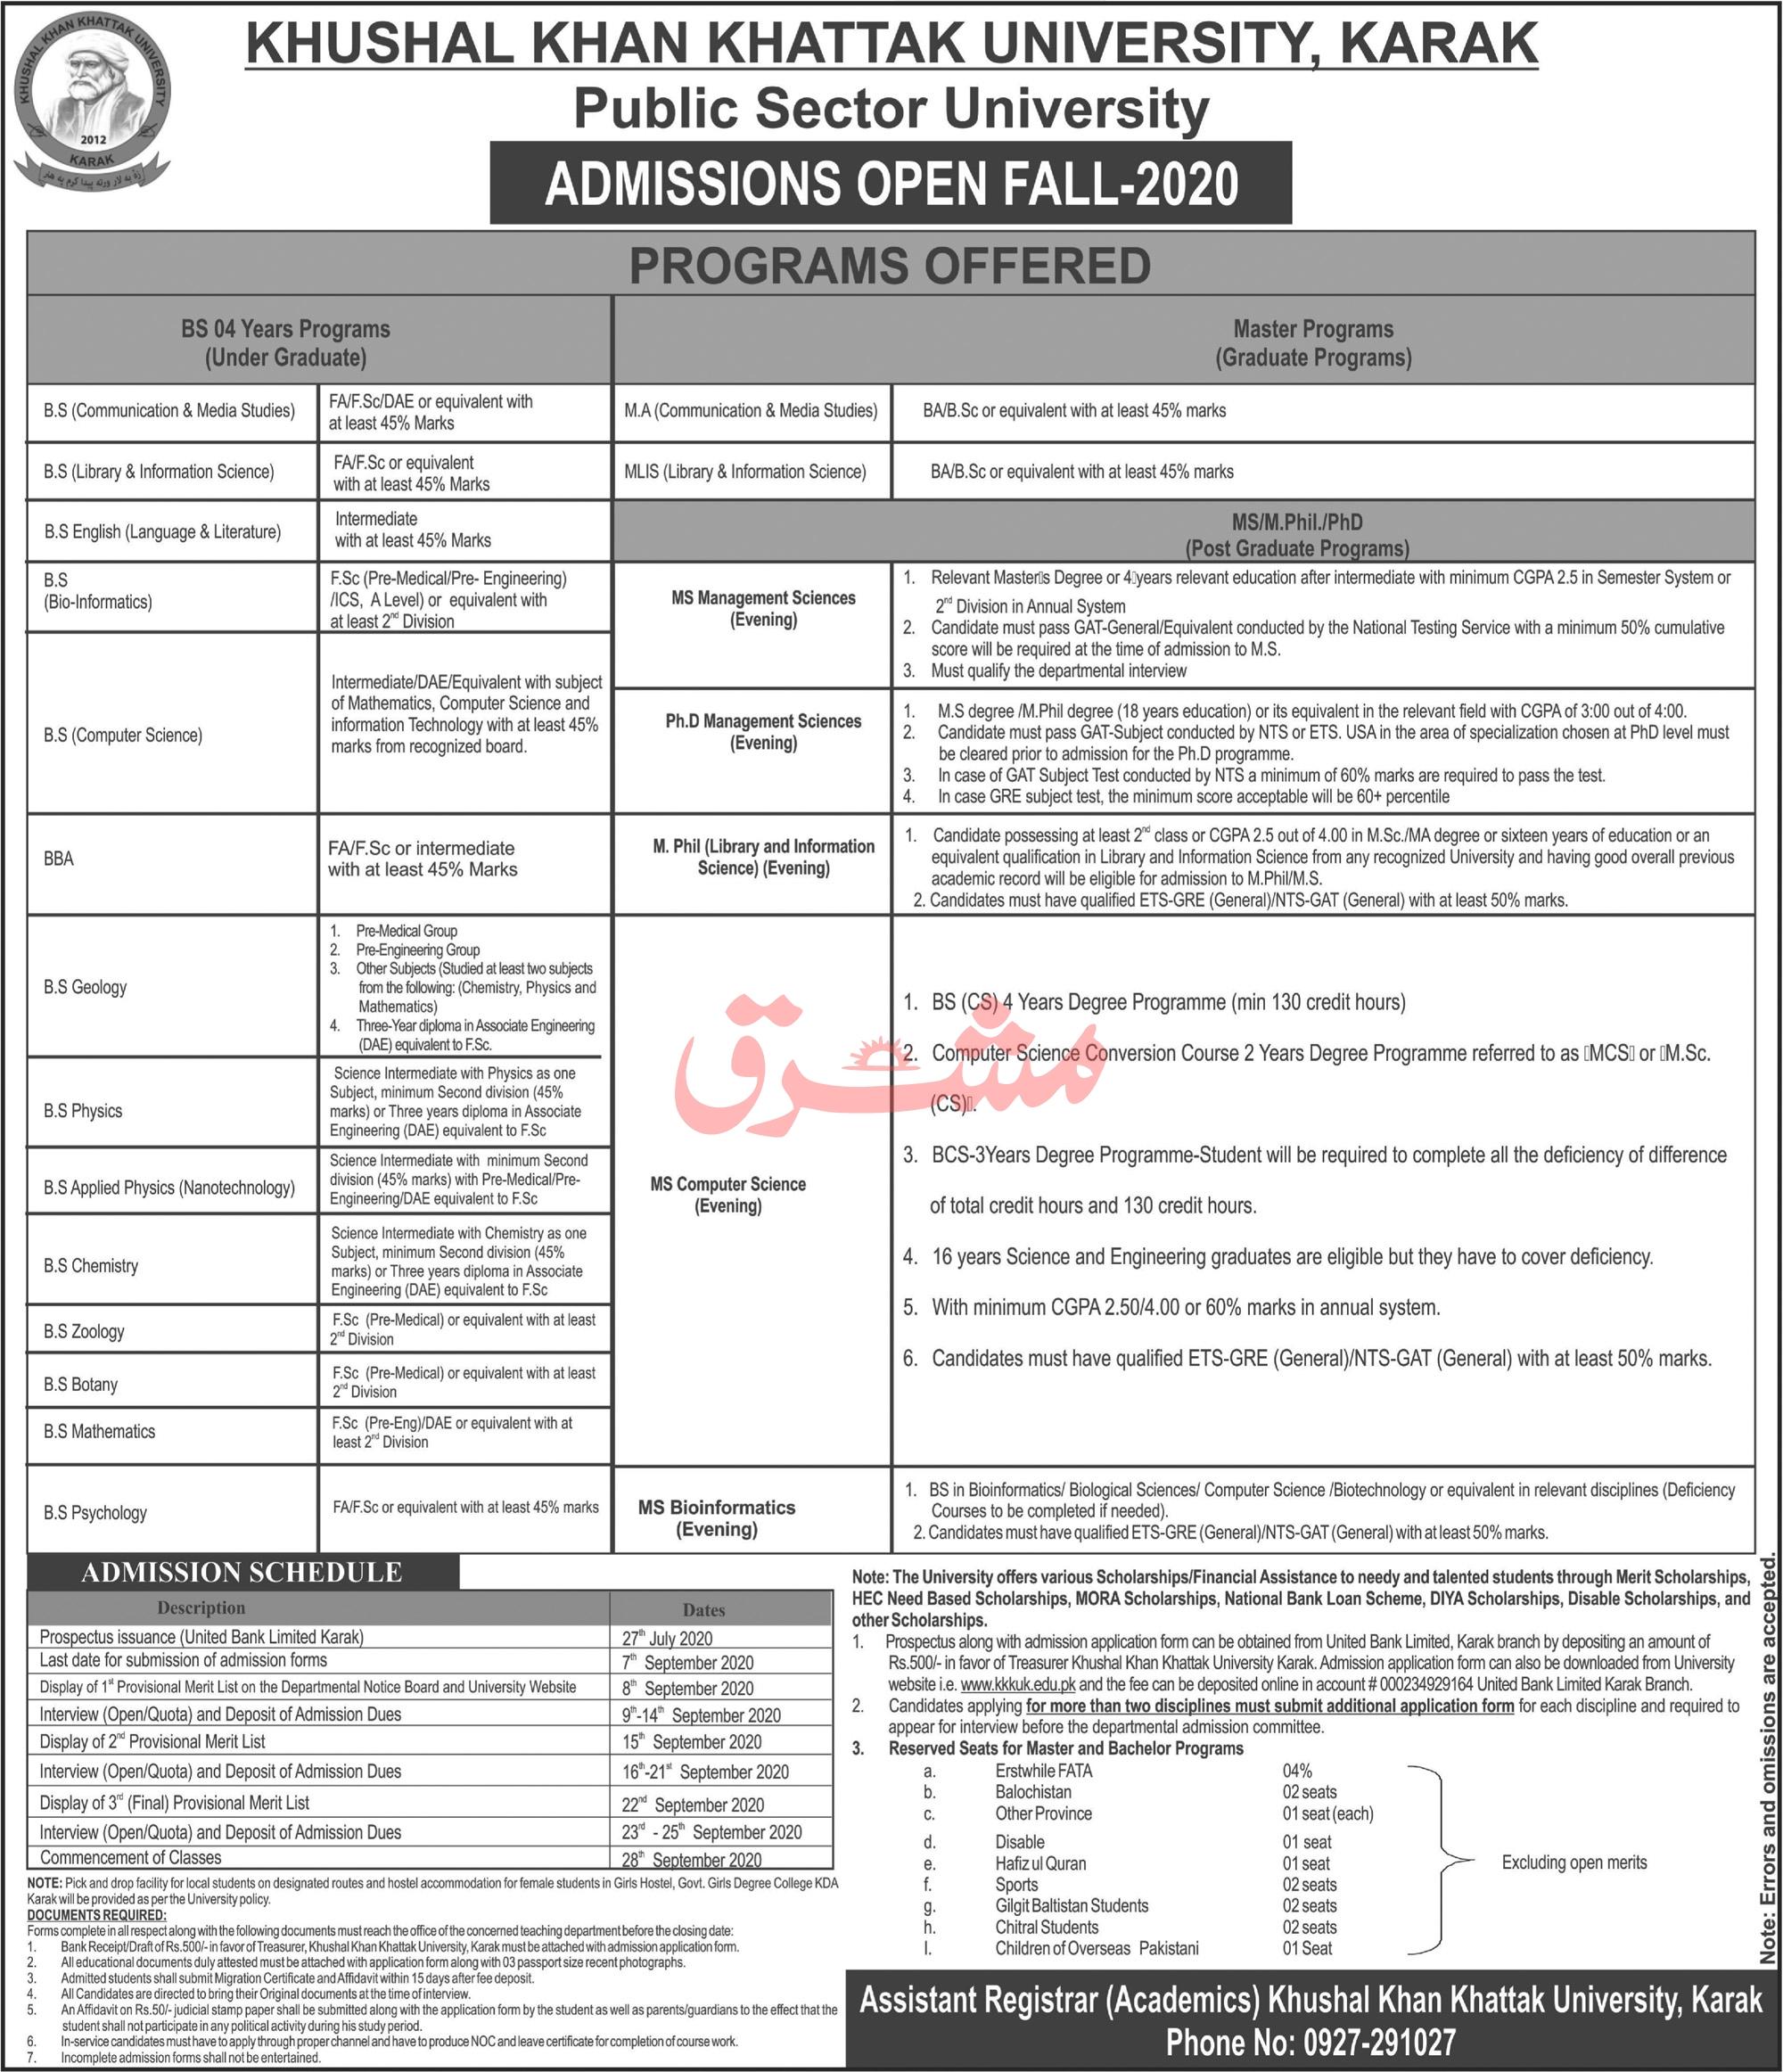 Khushal Khan Khattak University Karak Admission 2020